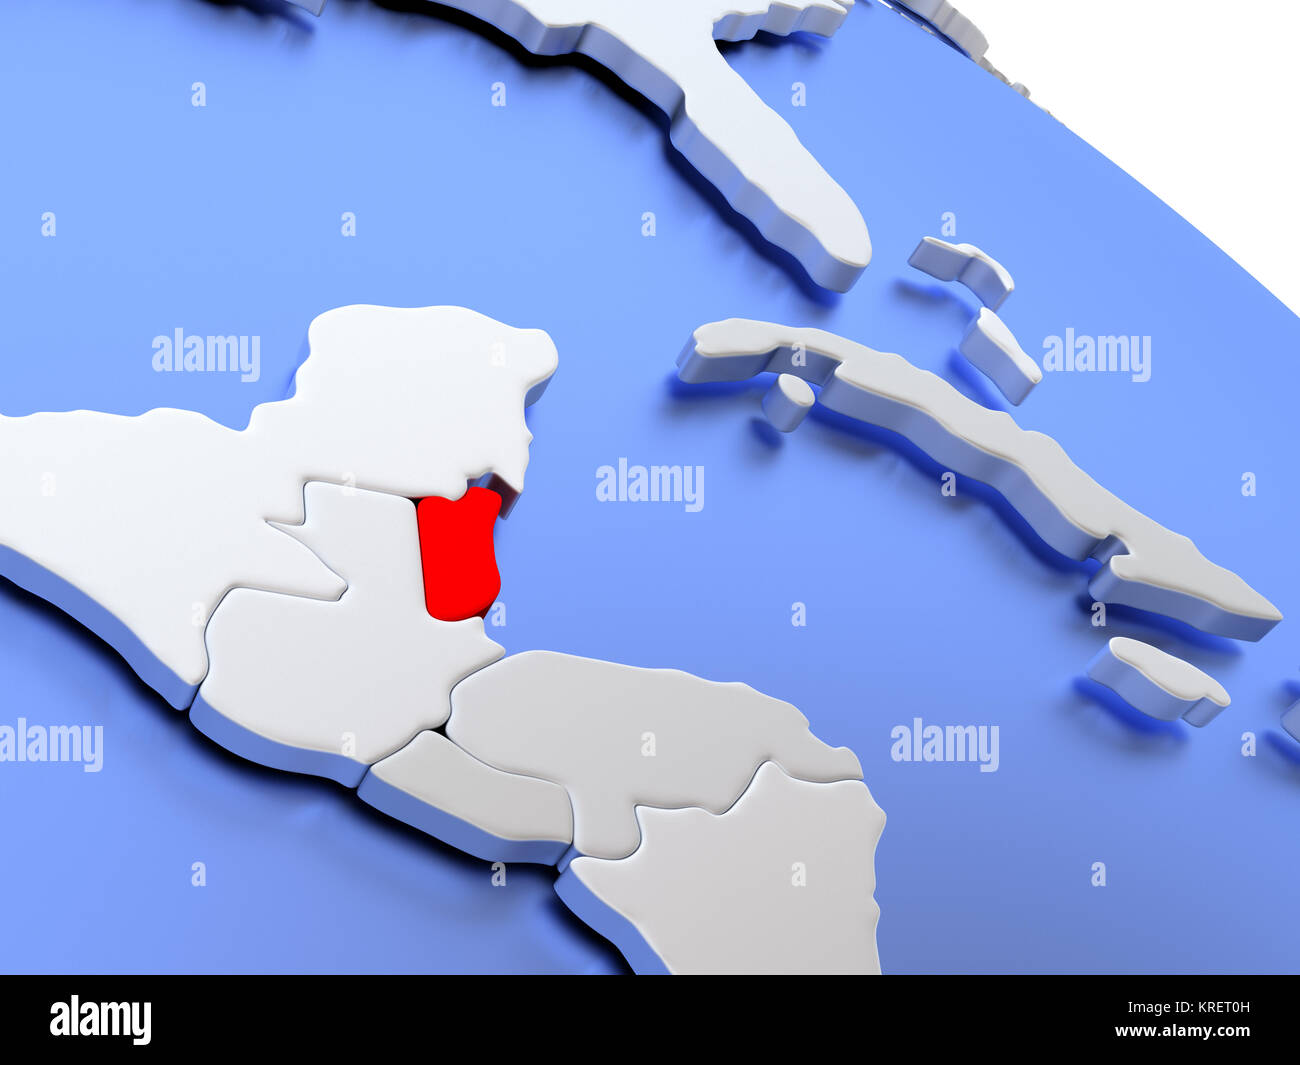 Belize On World Map Stock Photo 169356561 Alamy